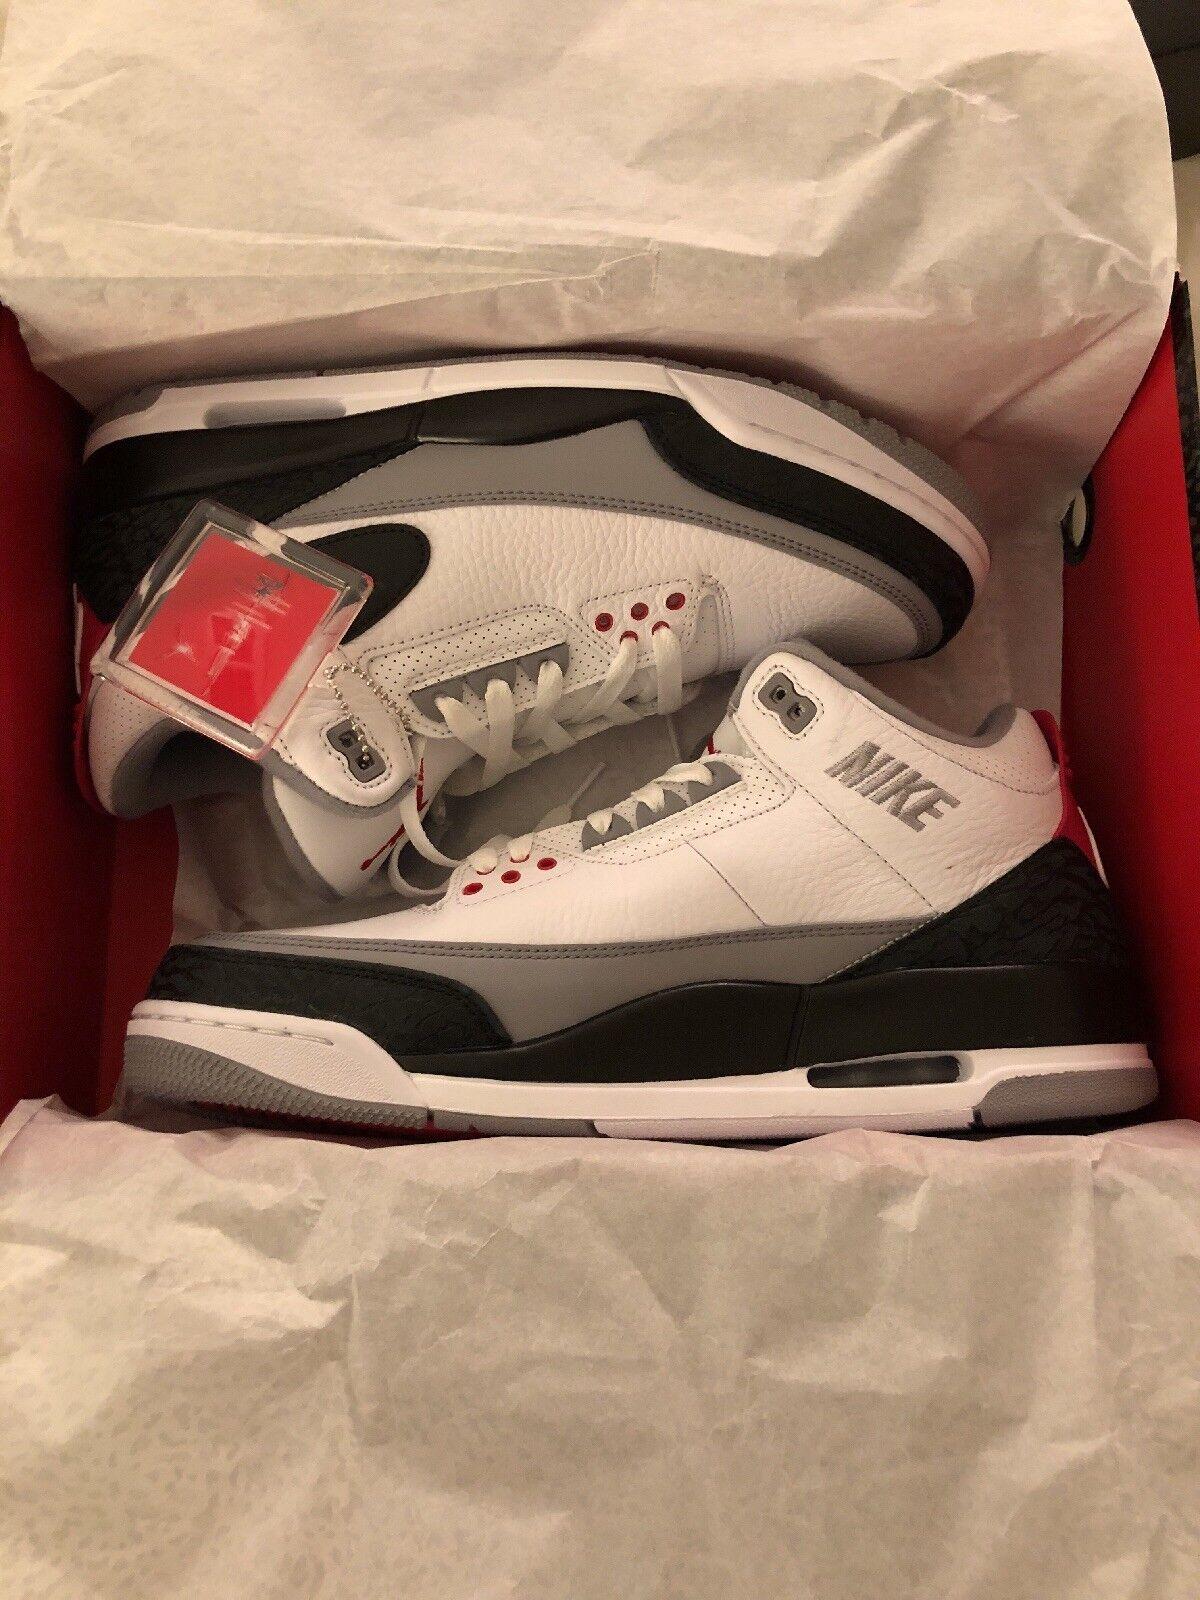 New Nike Air Jordan Retro 3 NRG Price reduction Casual wild